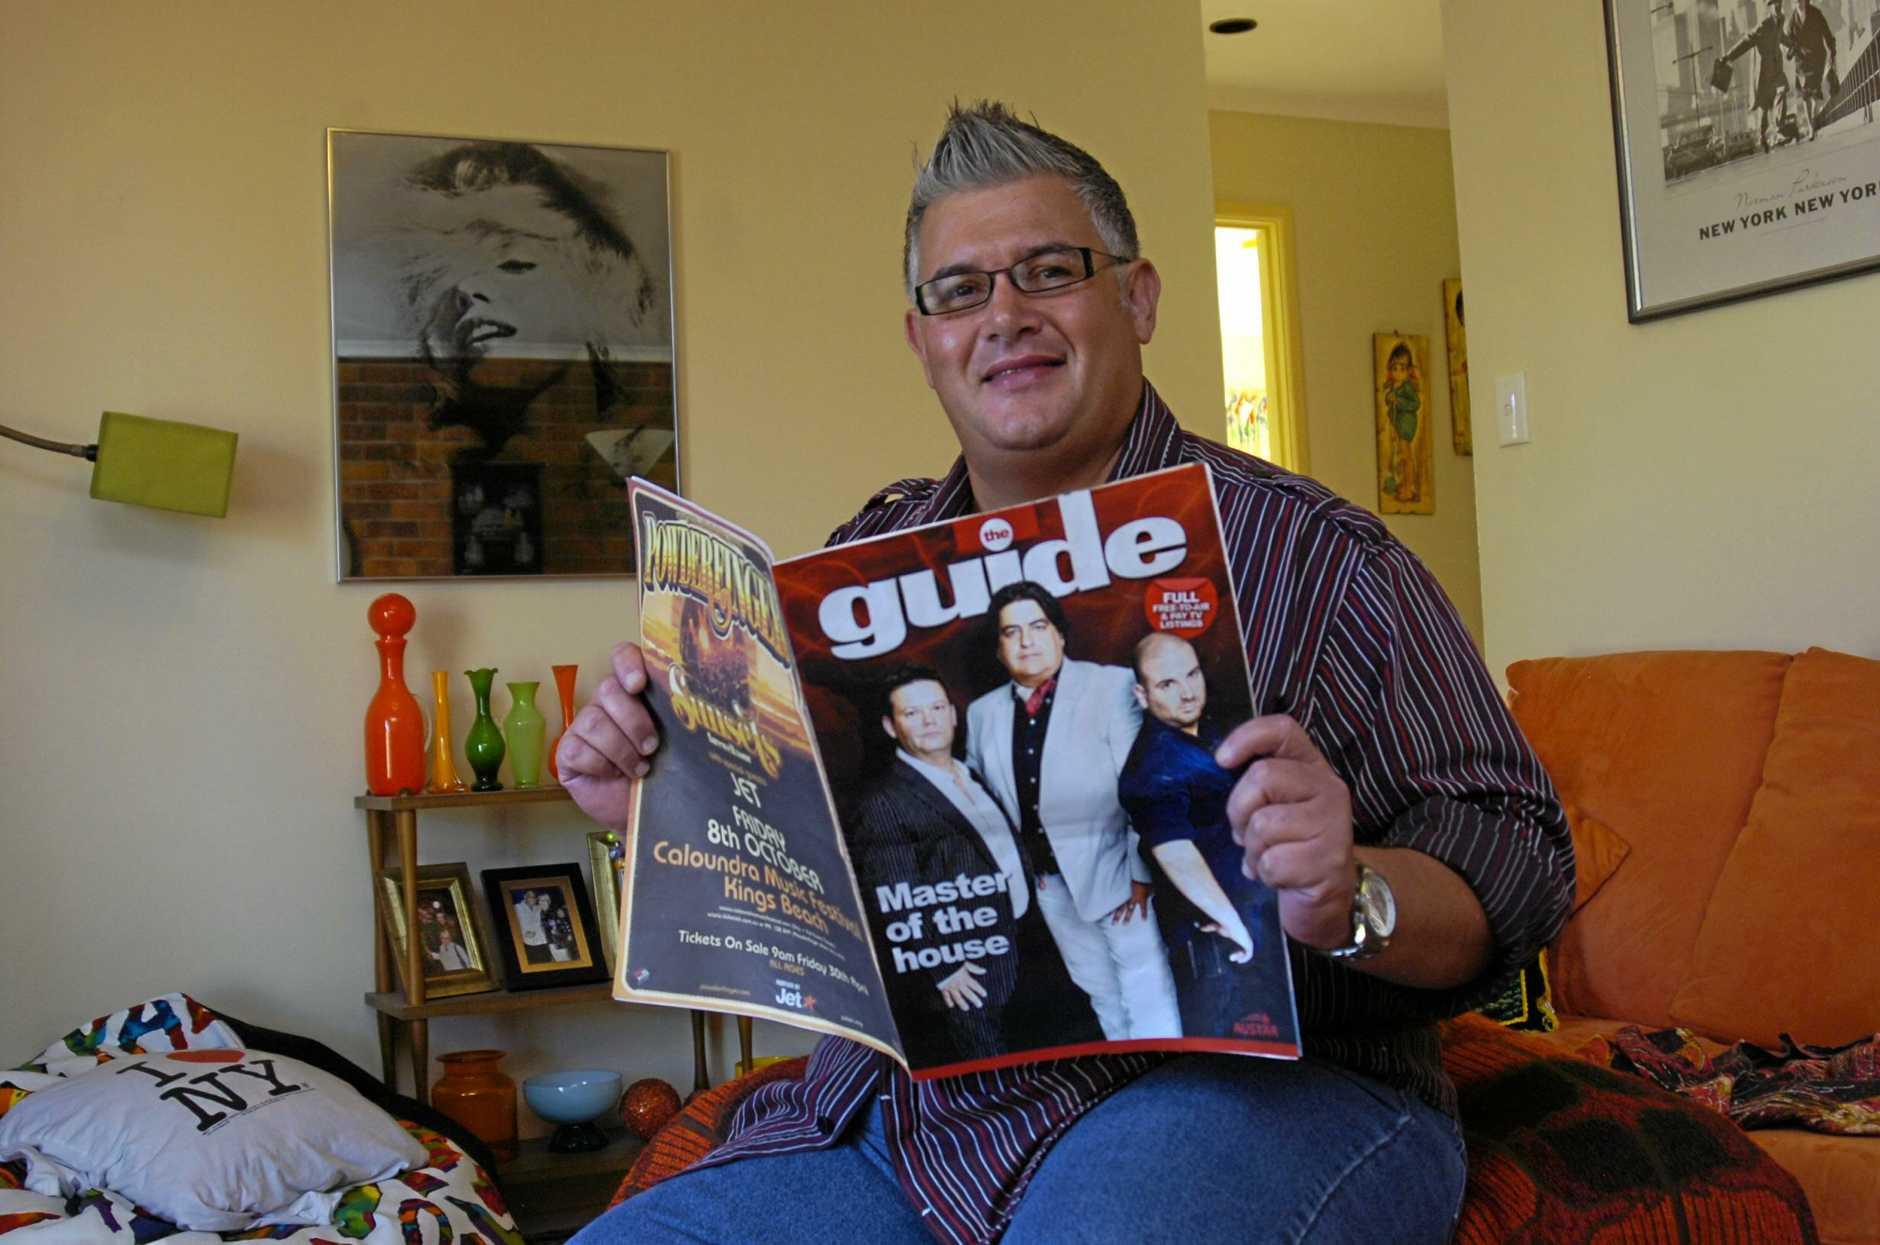 New TV guide - Artie Rocke.  Photo: ALISTAIR BRIGHTMAN 10h1057